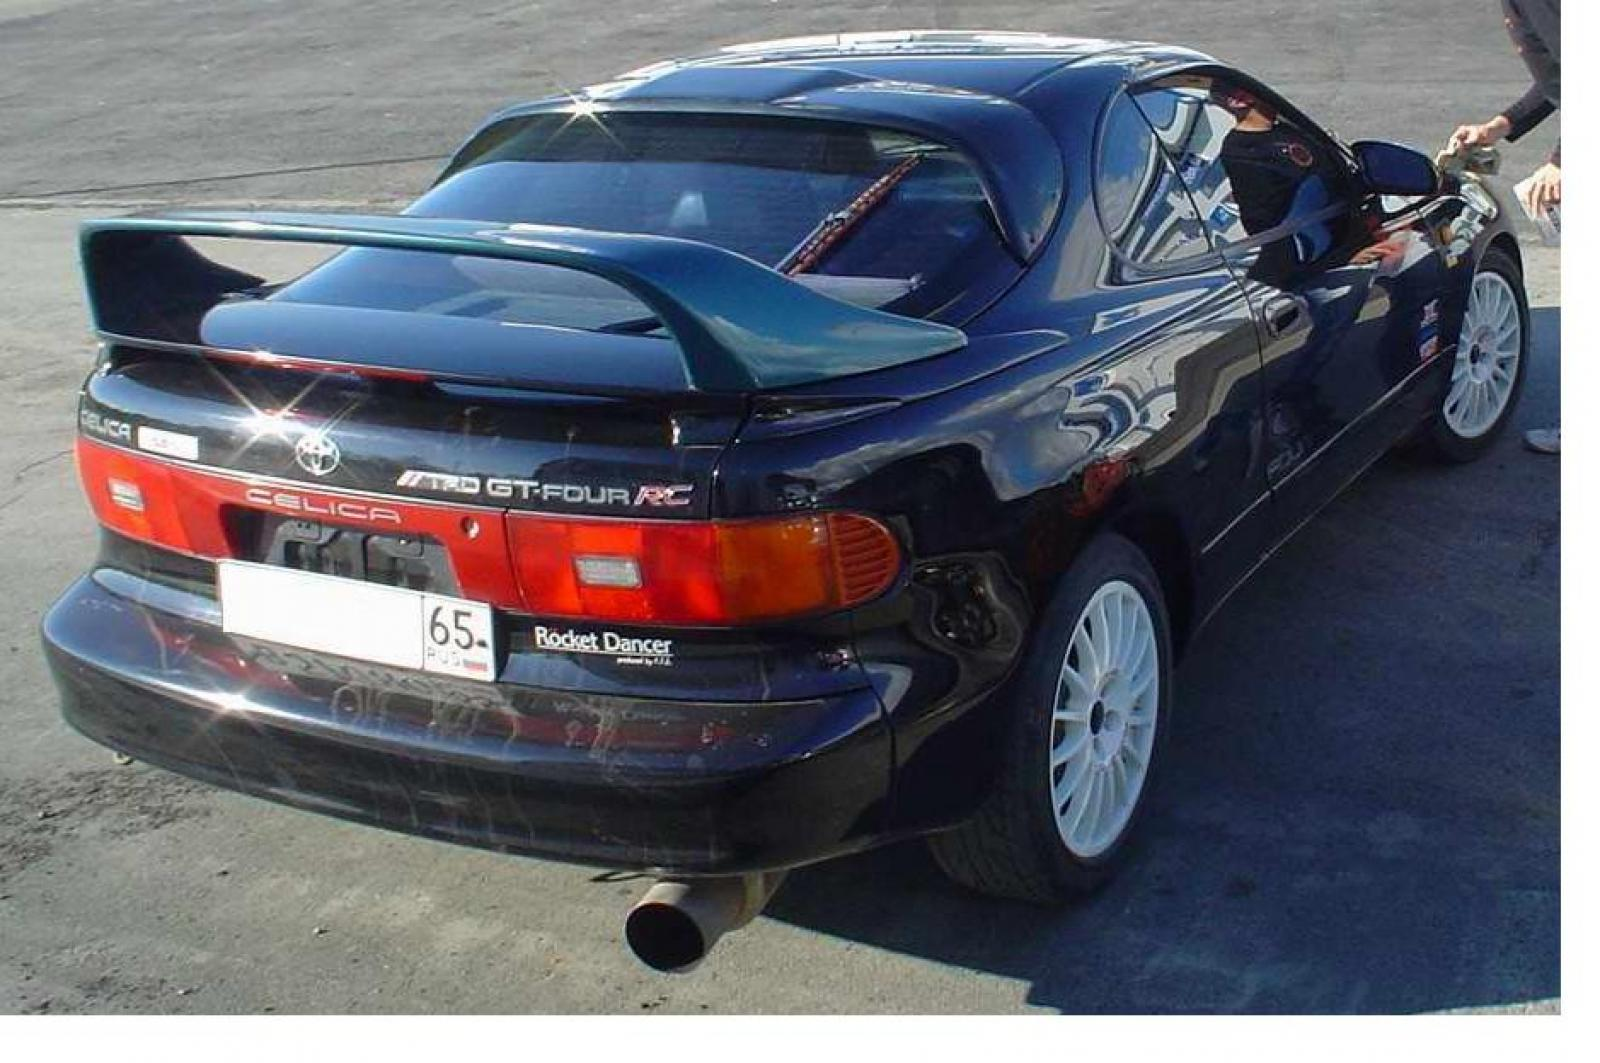 1991 Toyota Celica #8 Toyota Celica #8 800 1024 1280 1600 origin ...